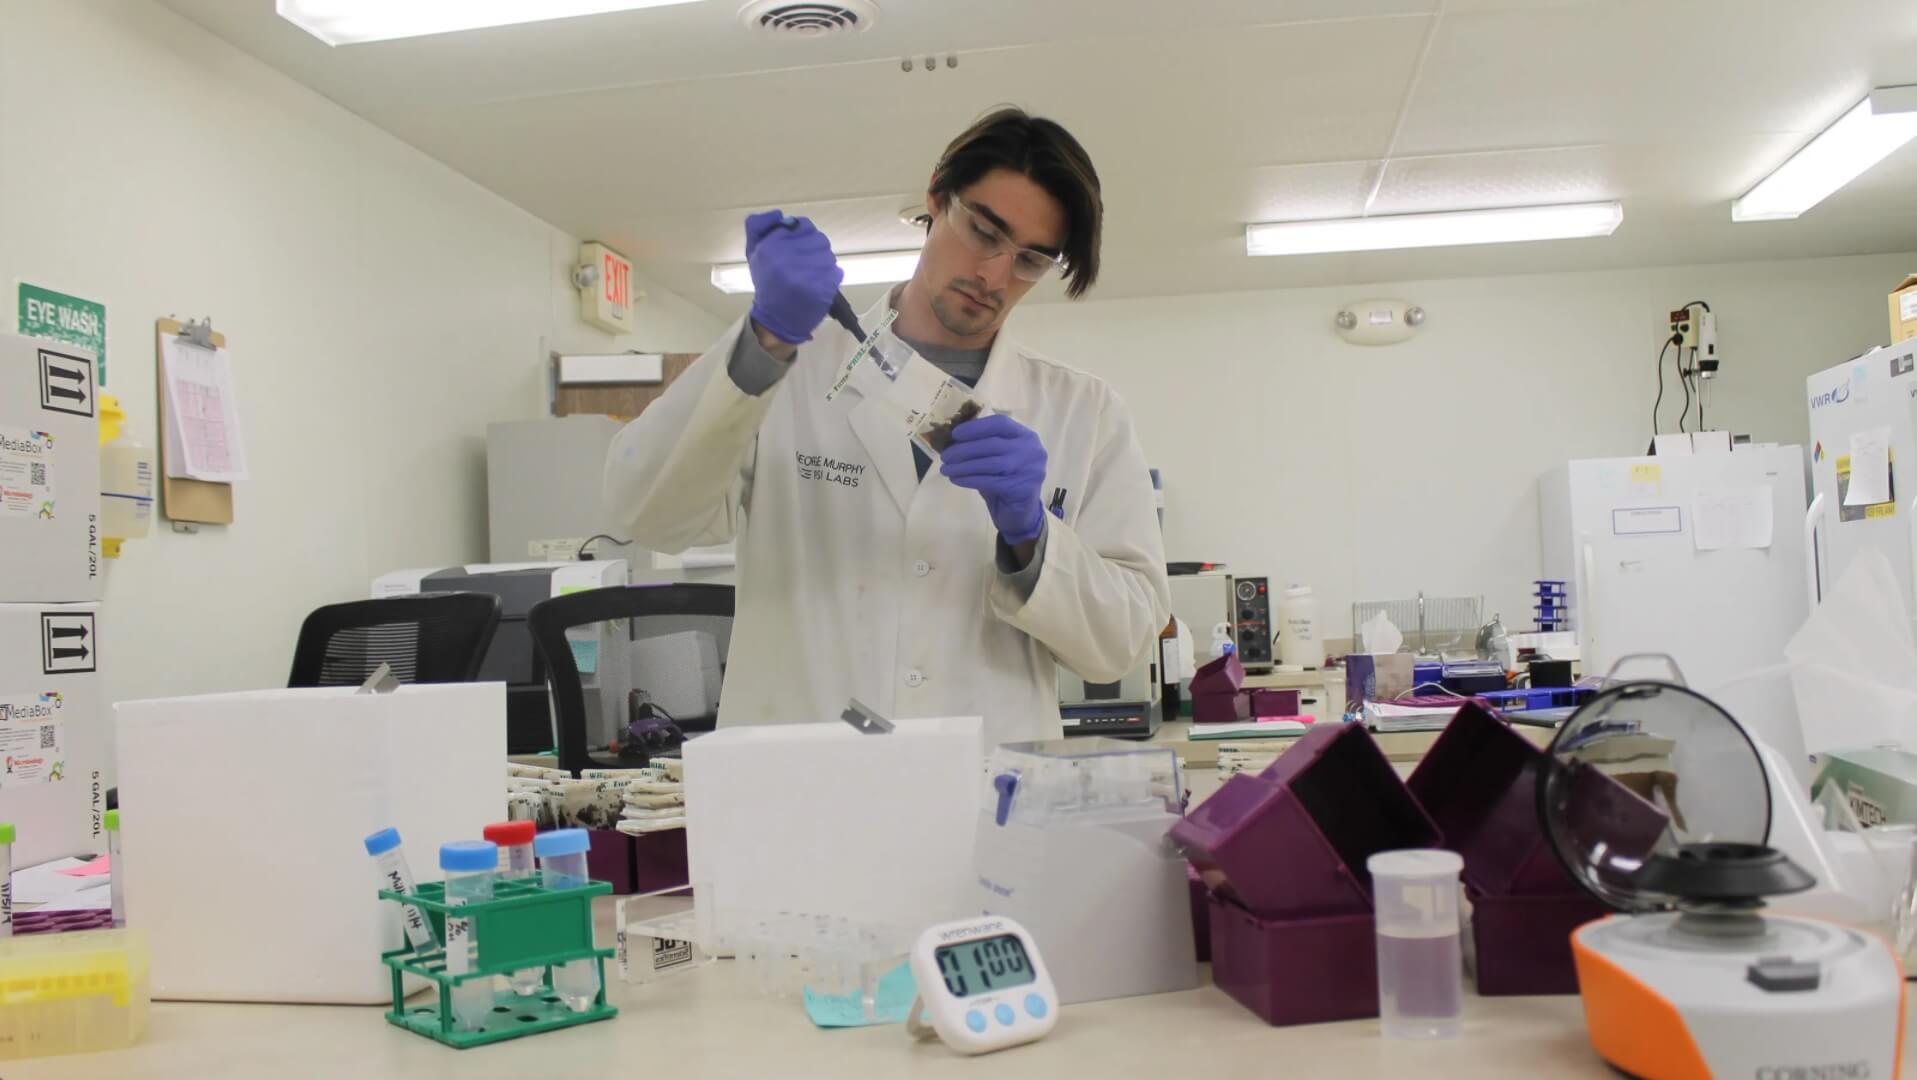 PSI Labs work process